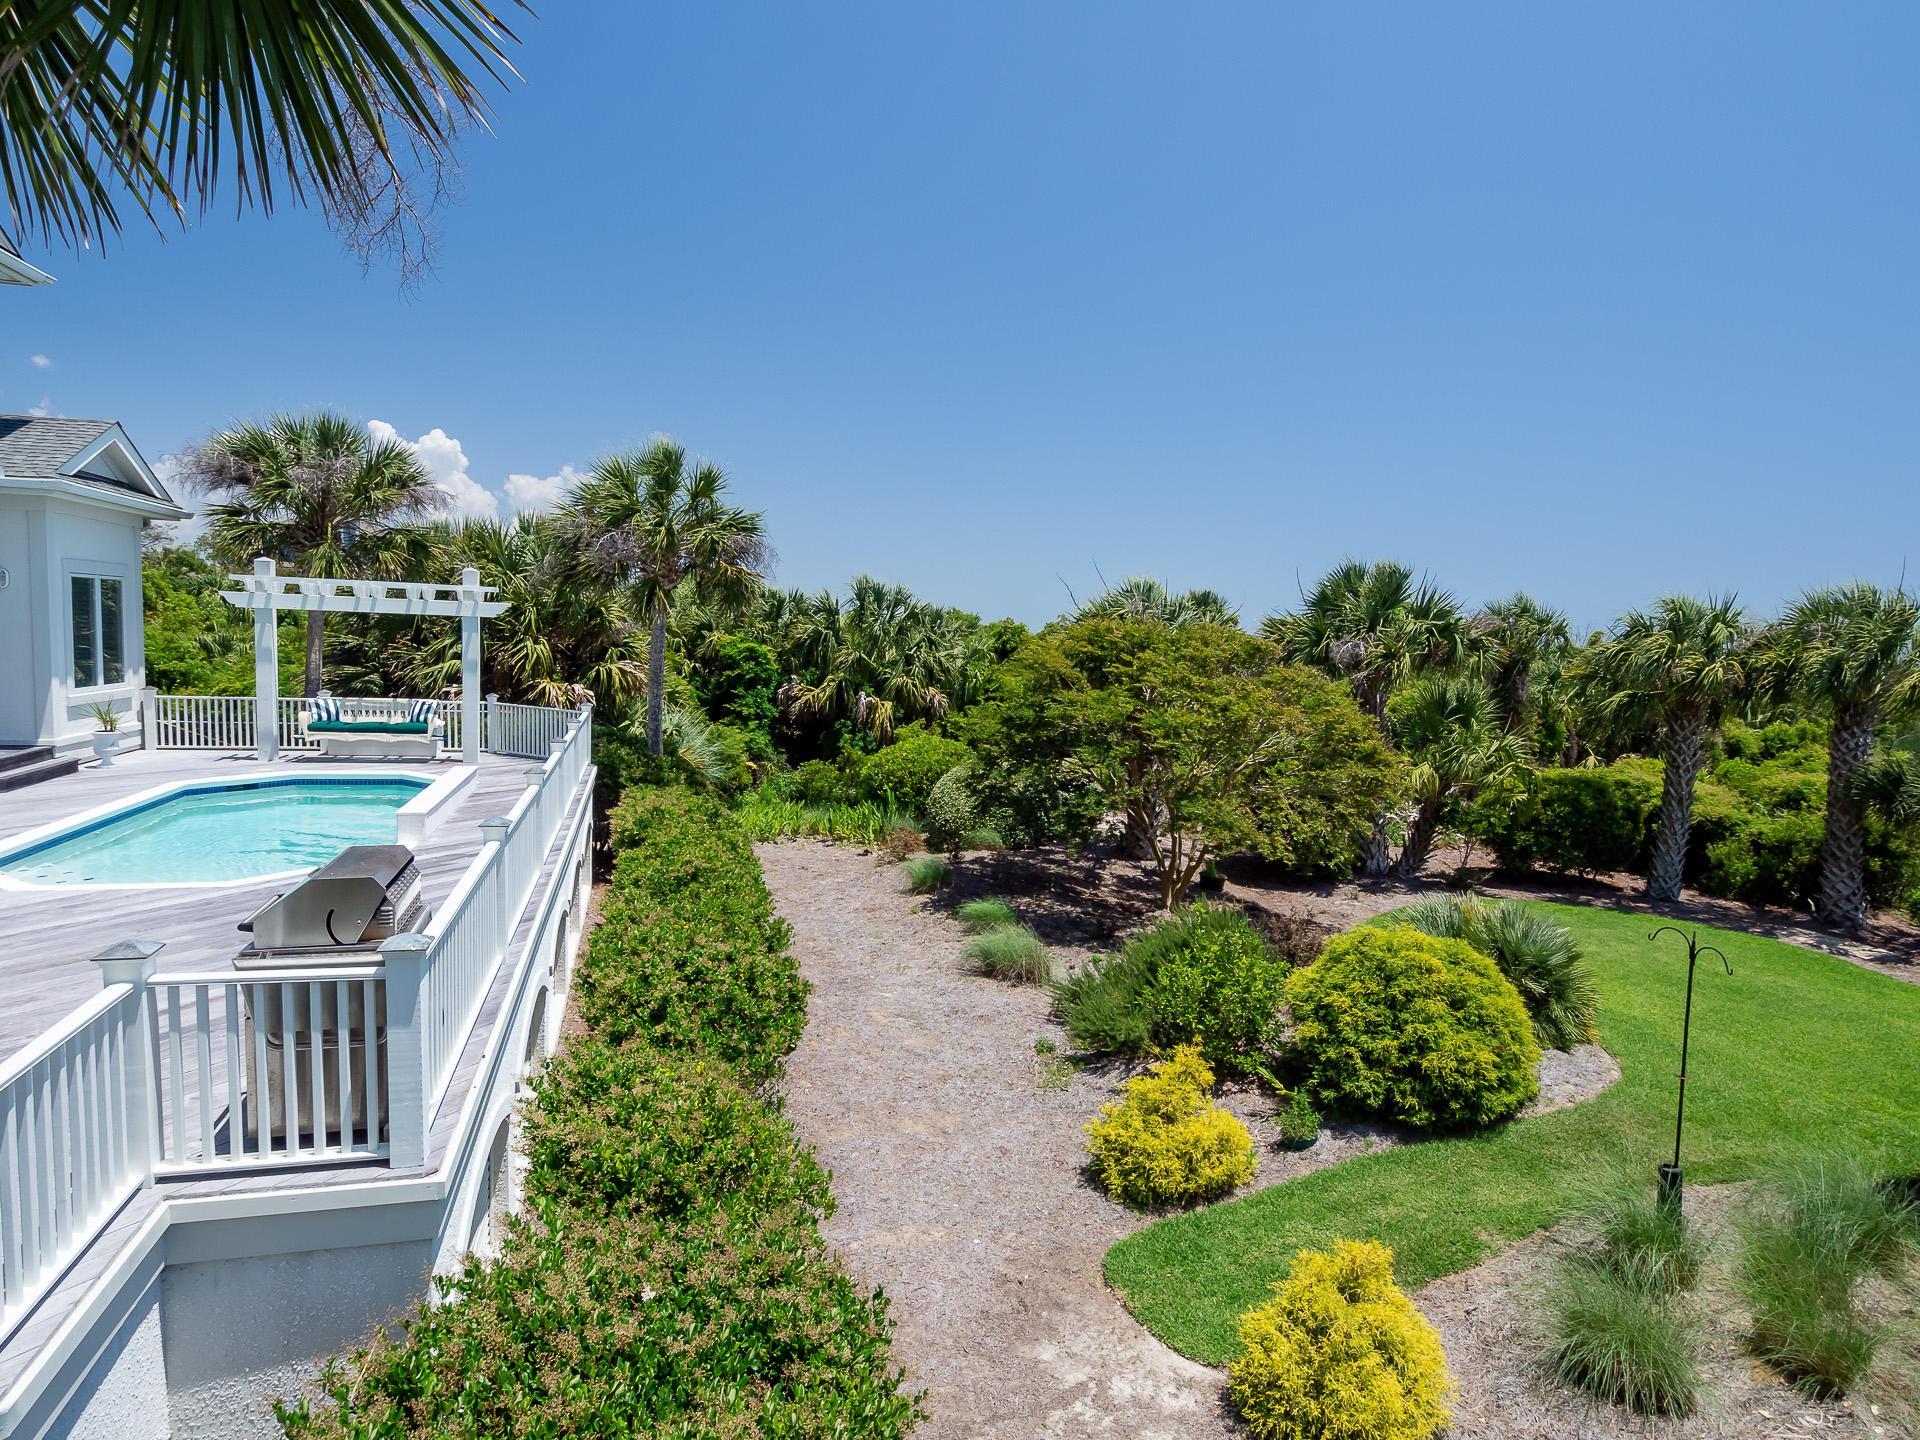 Seabrook Island Homes For Sale - 2216 Rolling Dune, Seabrook Island, SC - 54